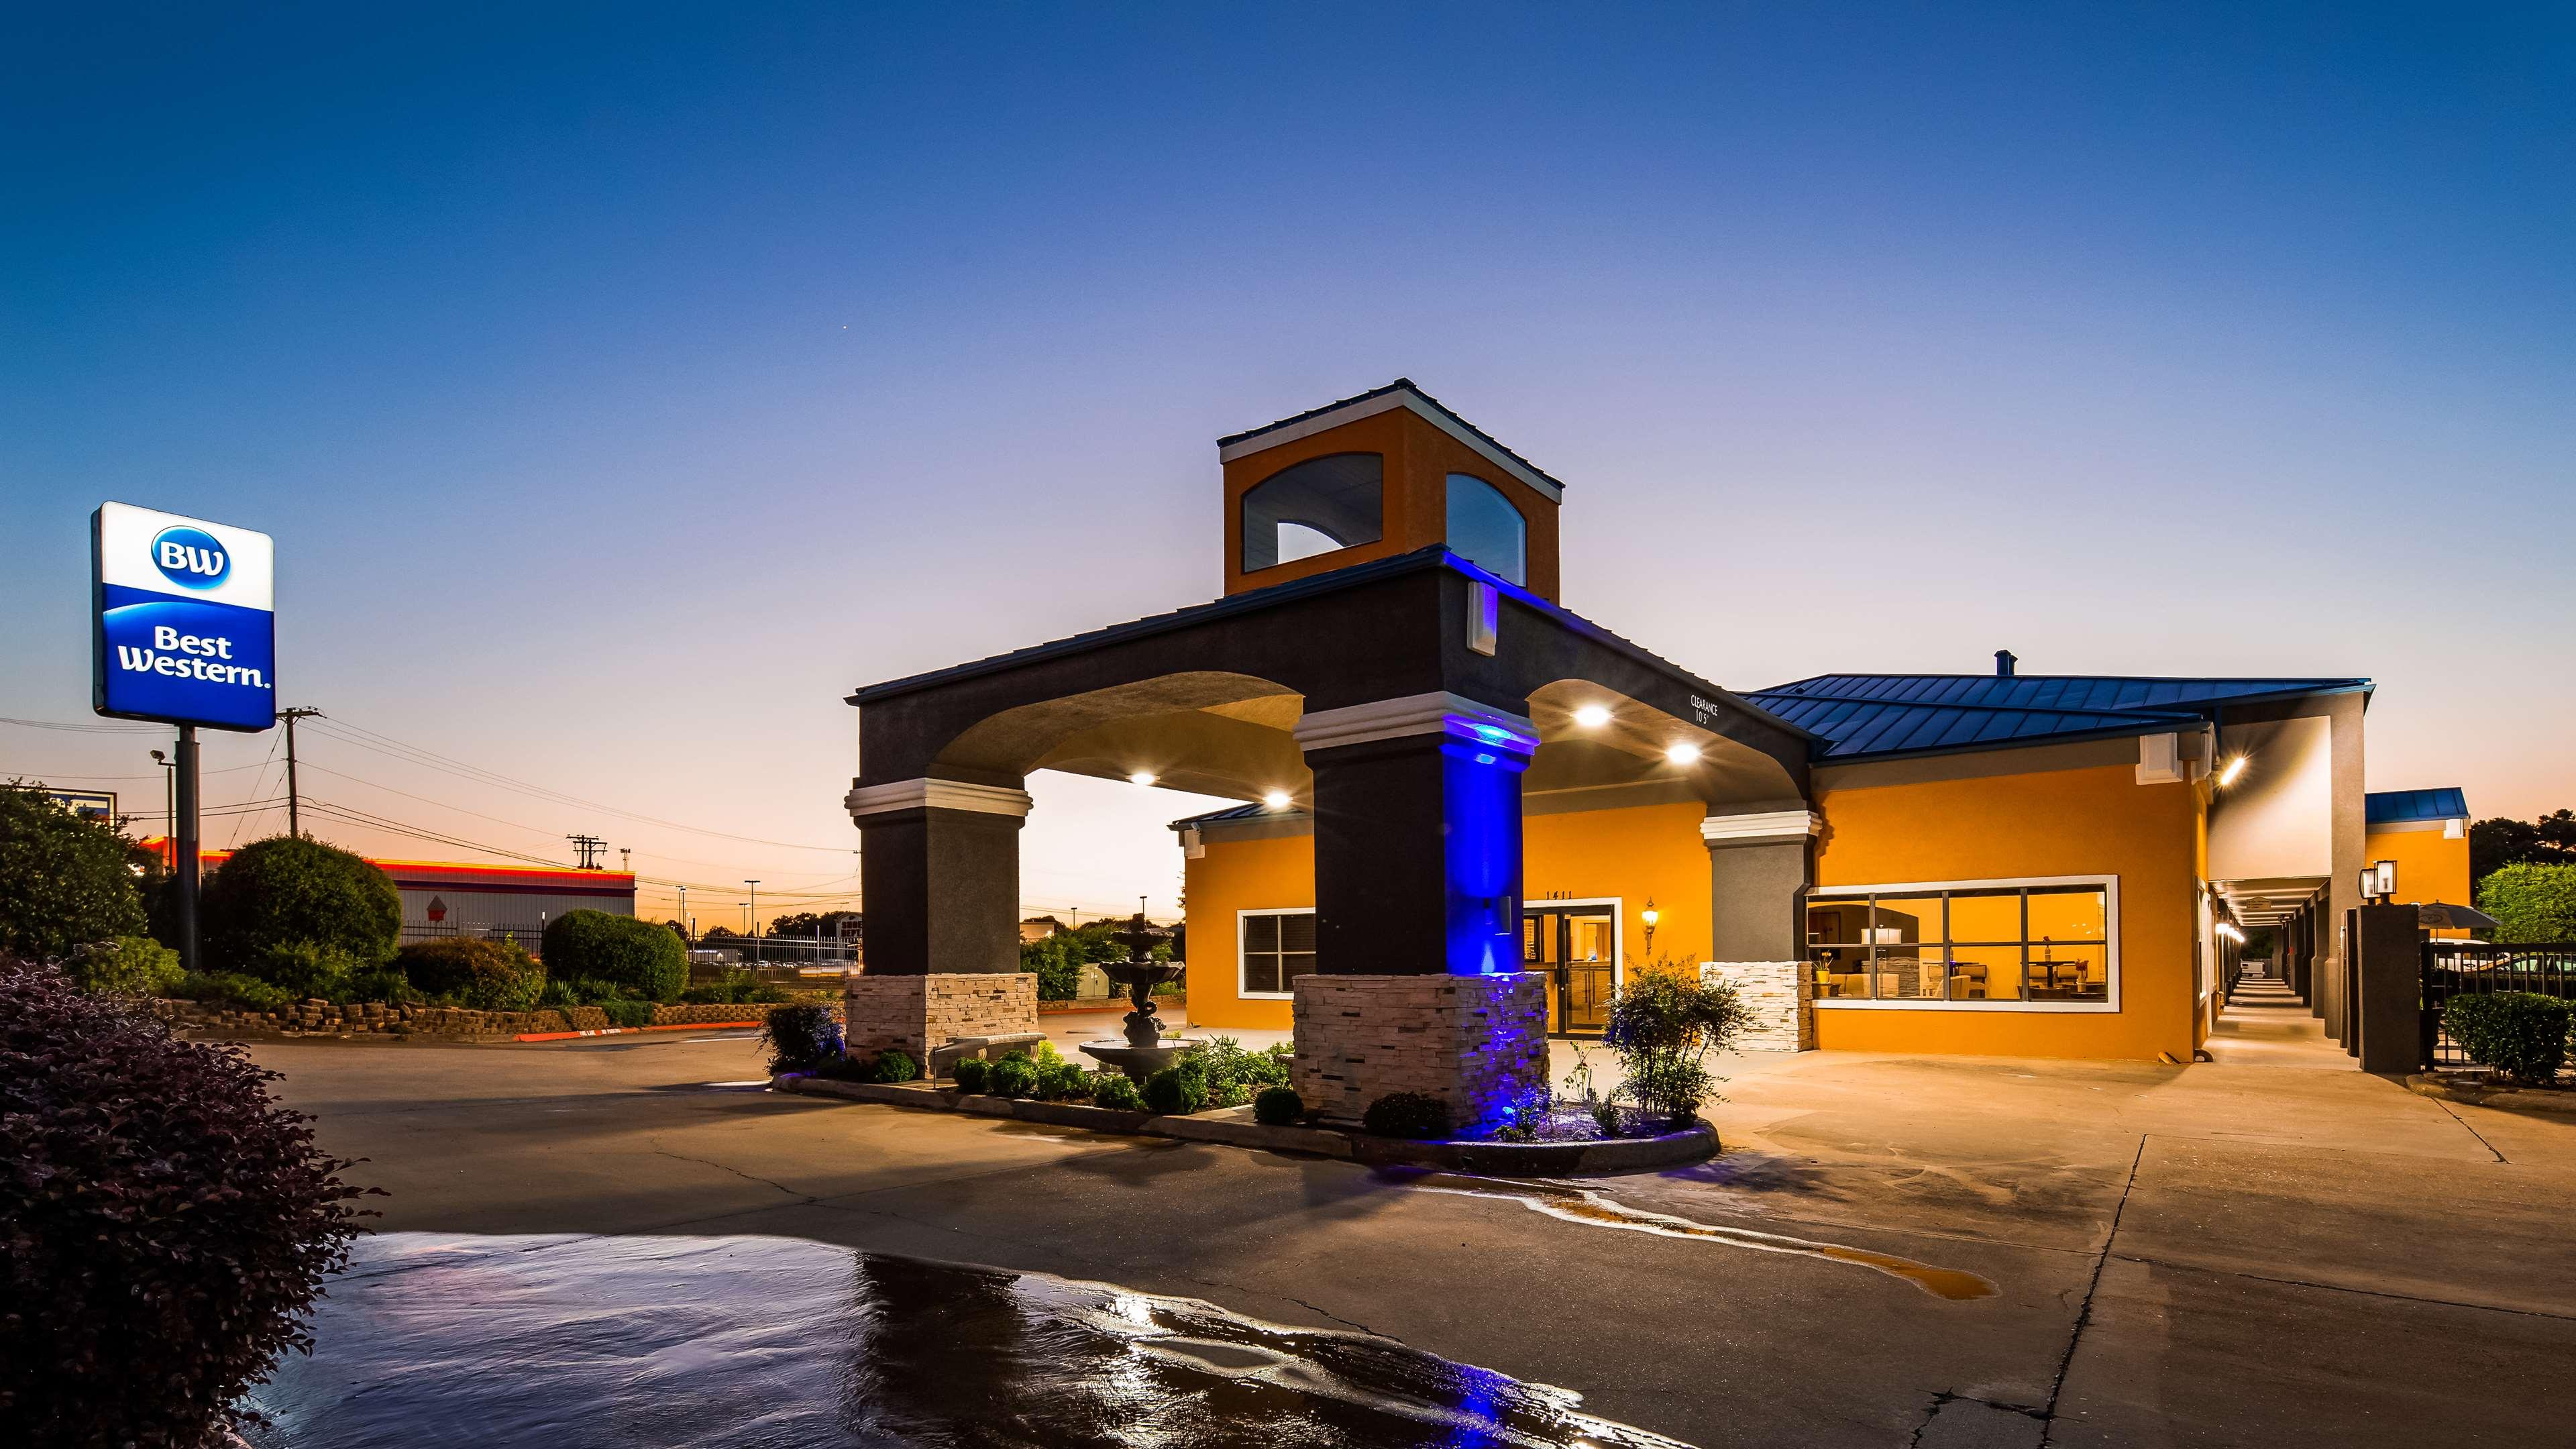 Welcome to the Best Western Inn of Kilgore!